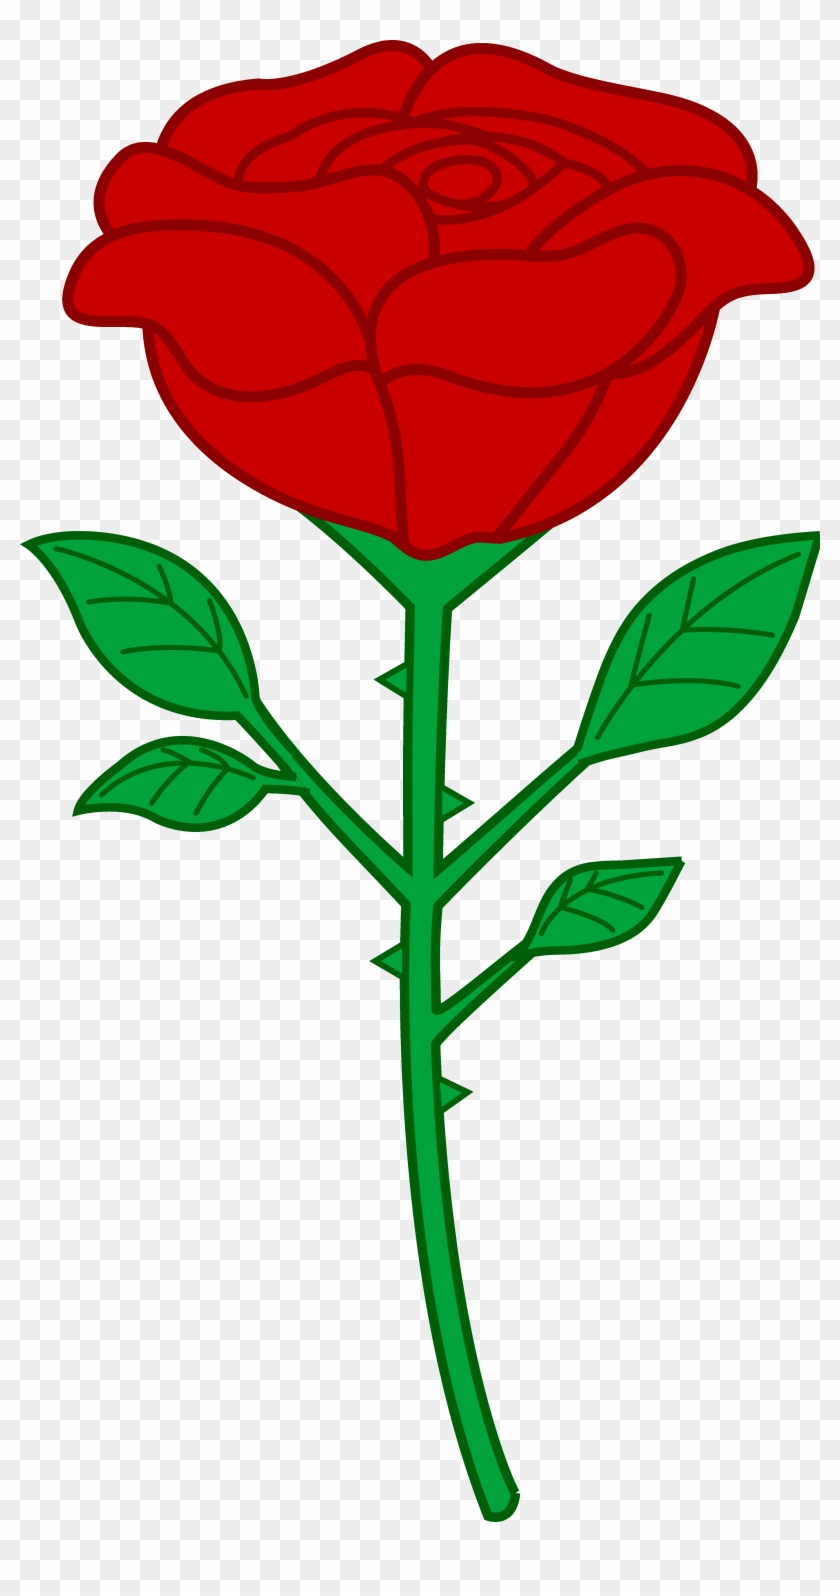 Rose hd clipart jpg Red Rose Outline Clipart - Cartoon Rose Transparent ... jpg